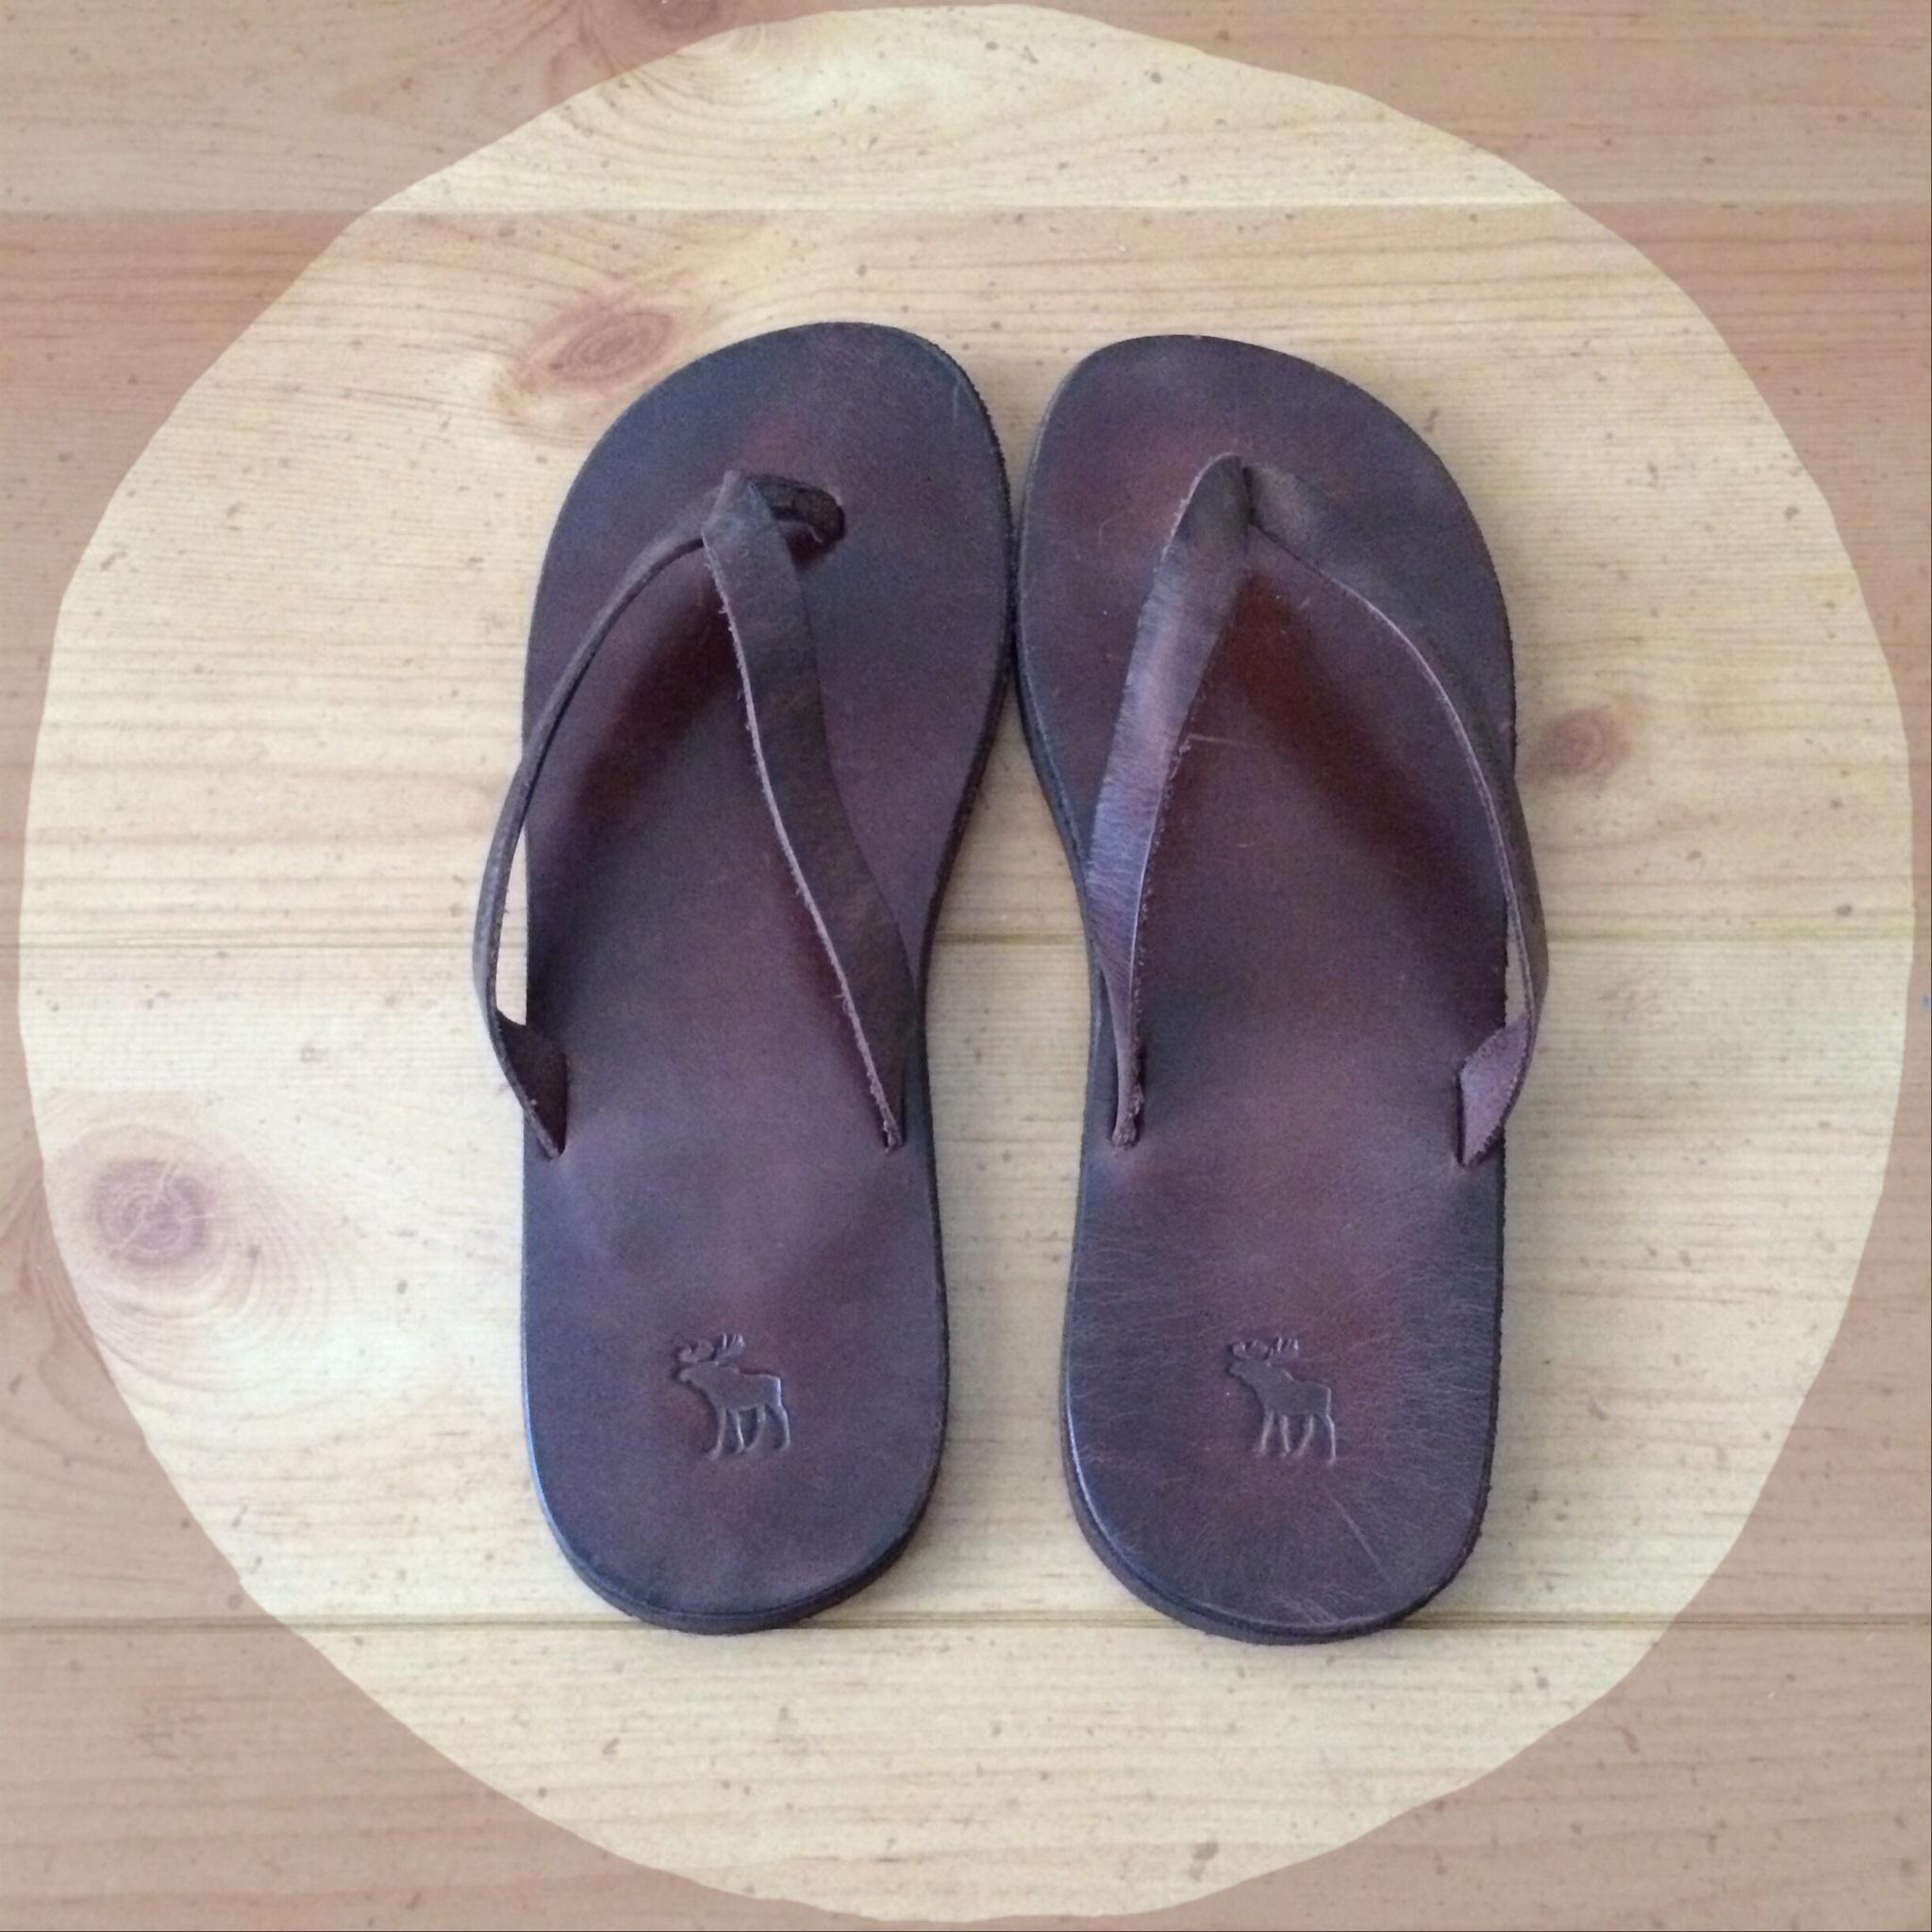 0e1bdffc5 Abercrombie   Fitch Leather Flip Flops on Storenvy